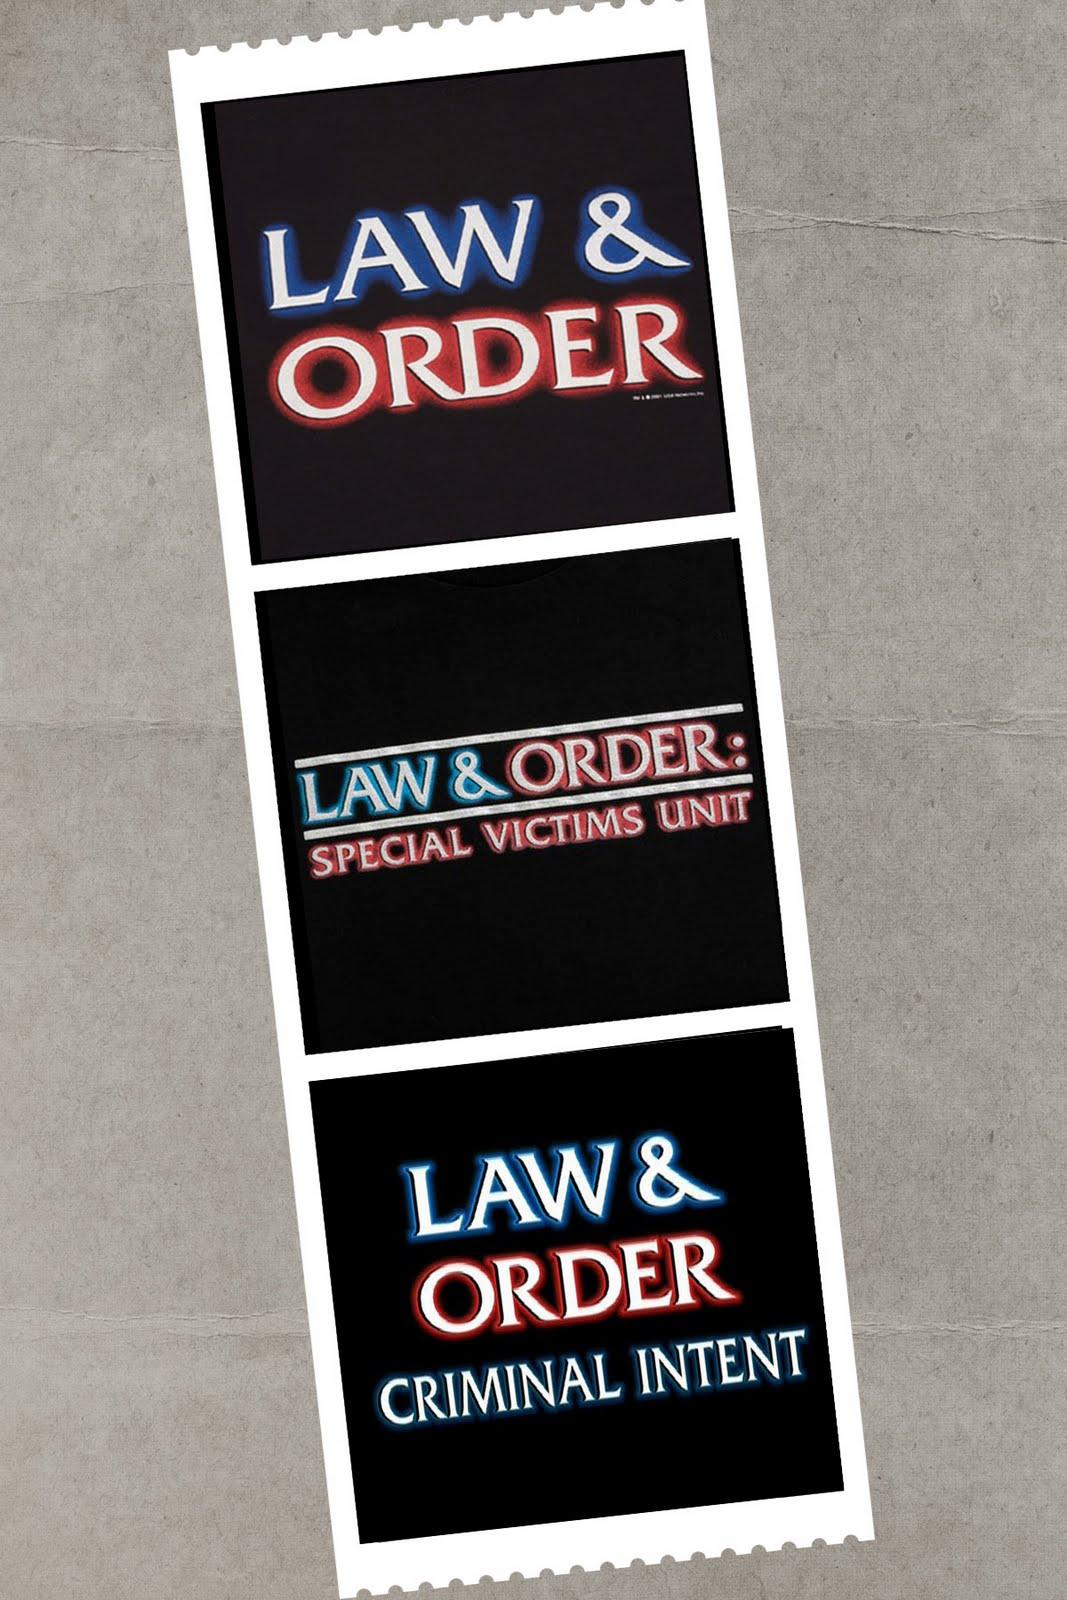 http://2.bp.blogspot.com/_yoQ512EaRs0/S8J5tdXQ3JI/AAAAAAAACGE/-YEI1AeMFLM/s1600/041110_law+and+order+pic.jpg